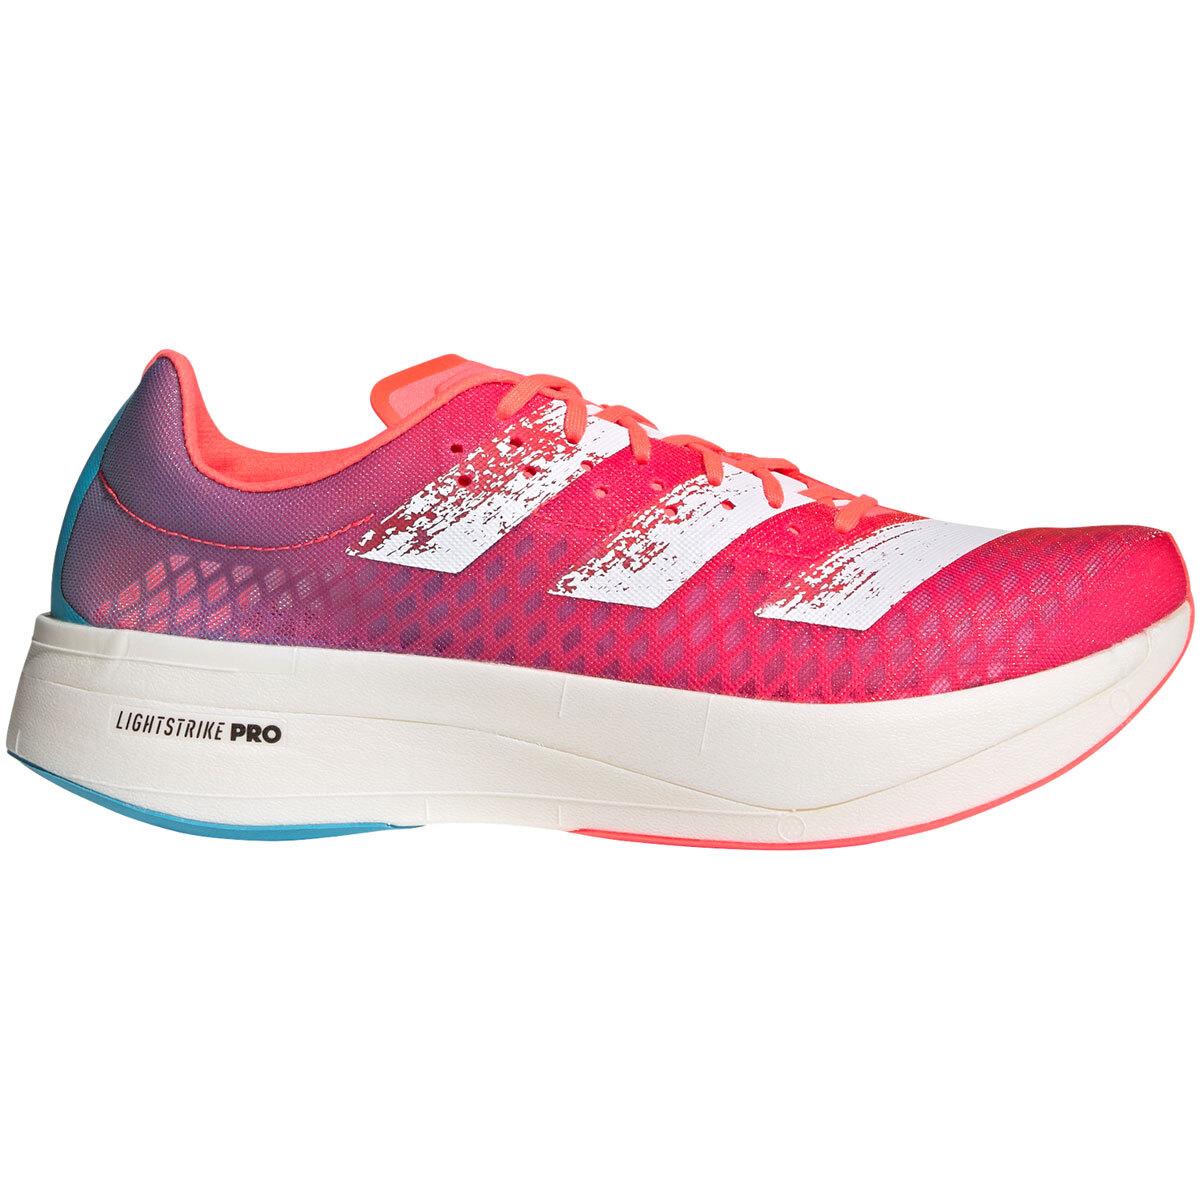 Adidas Adizero Adios Pro Running Shoe - Color: Signal Pink/Cloud White/Shock Pink - Size: M4/W5.5 - Width: Regular, Signal Pink/Cloud White/Shock Pink, large, image 1